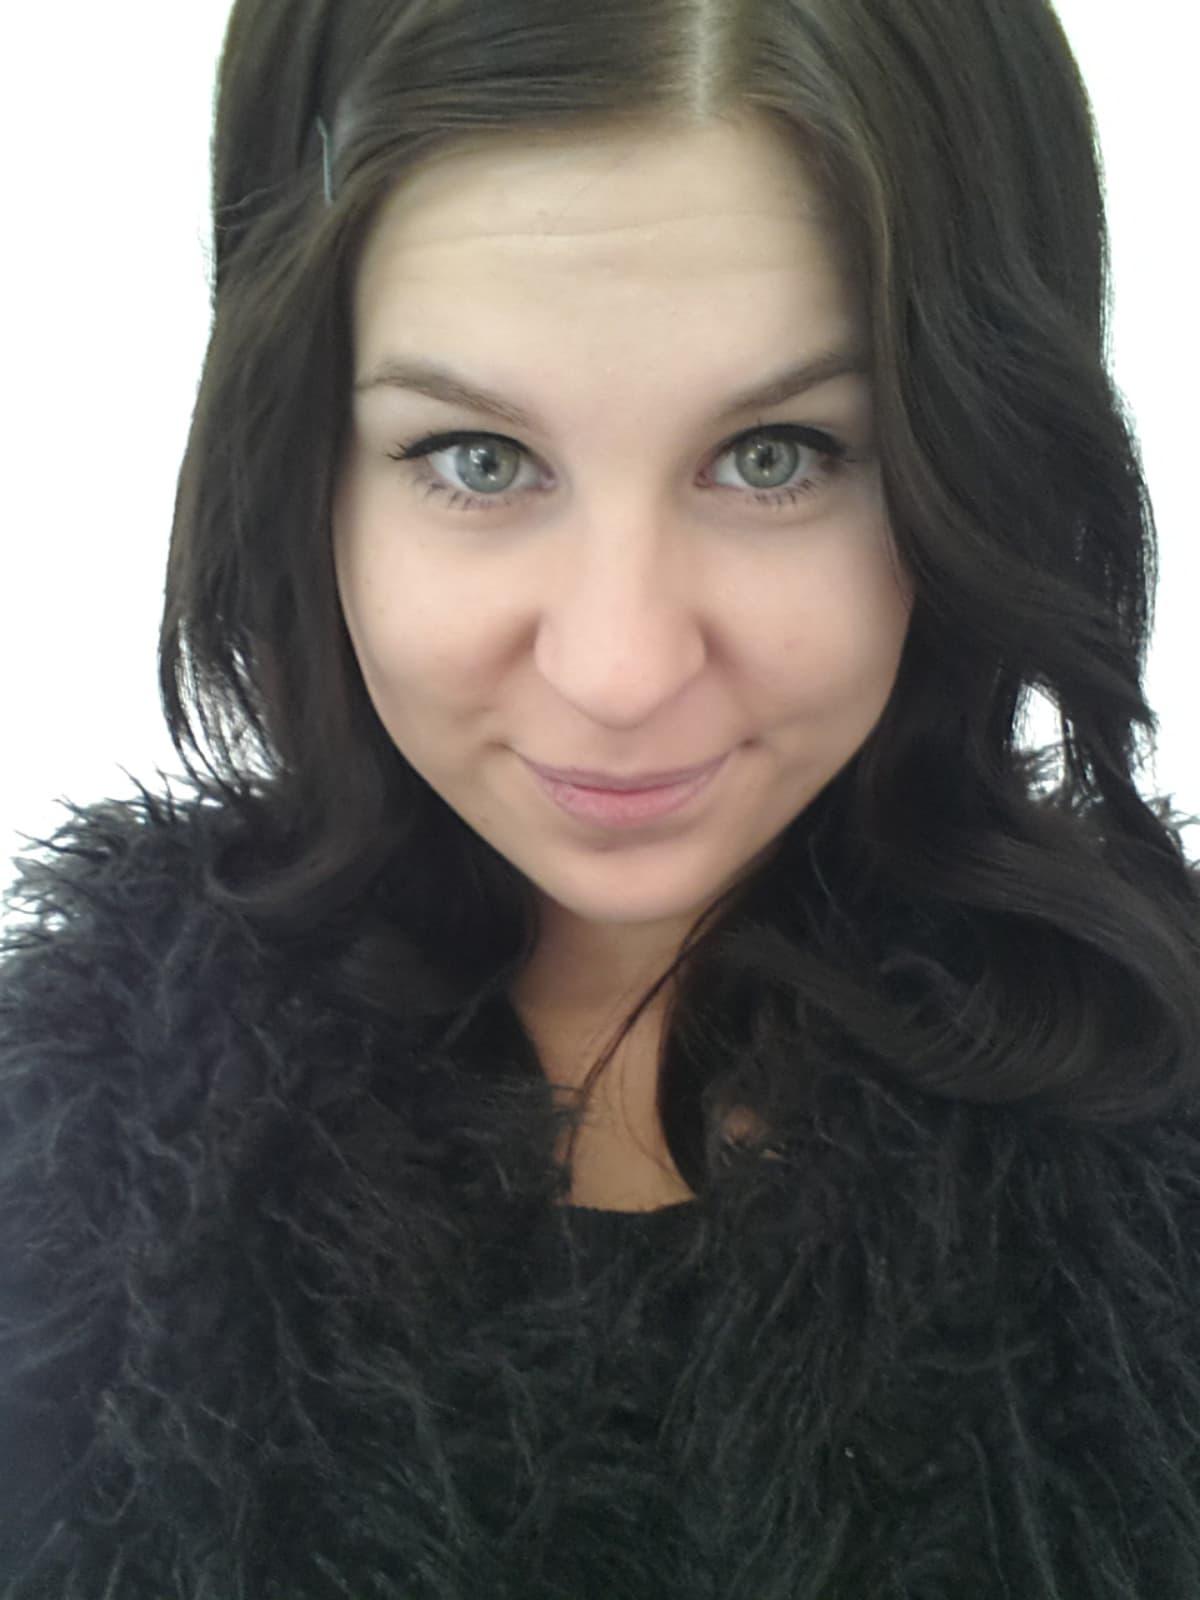 Nuorisokahvila sai alkunsa Emilia Puusaaren ideasta.